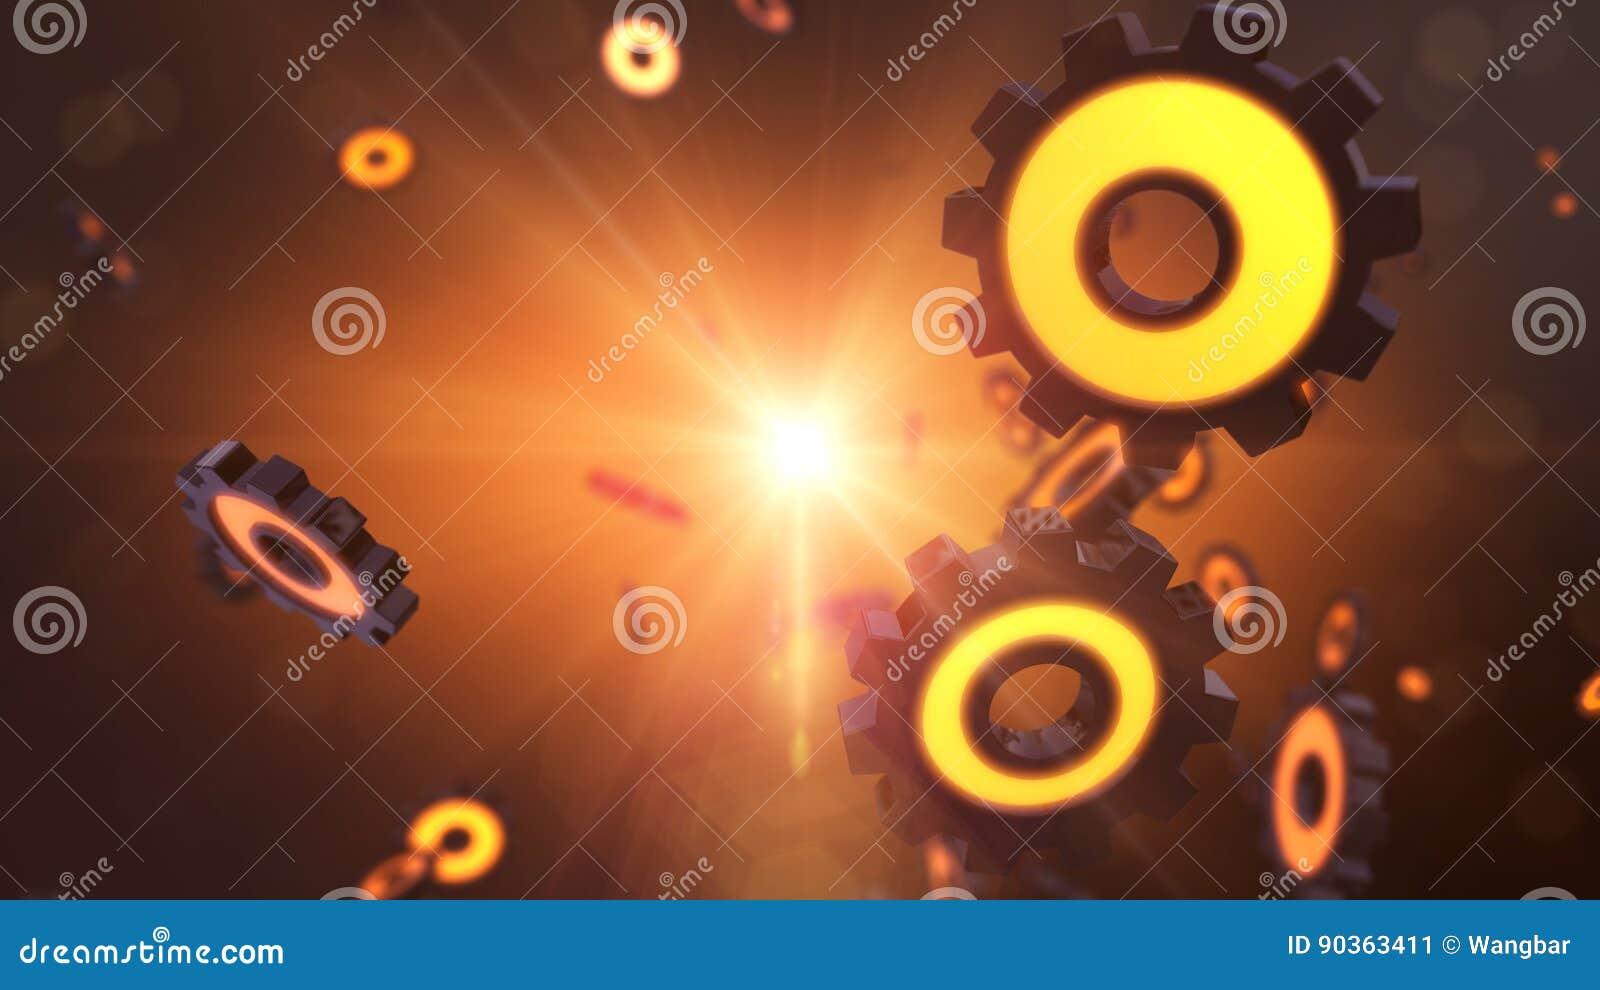 Orange futuristic gear steampunk concept - gear wheel explosion